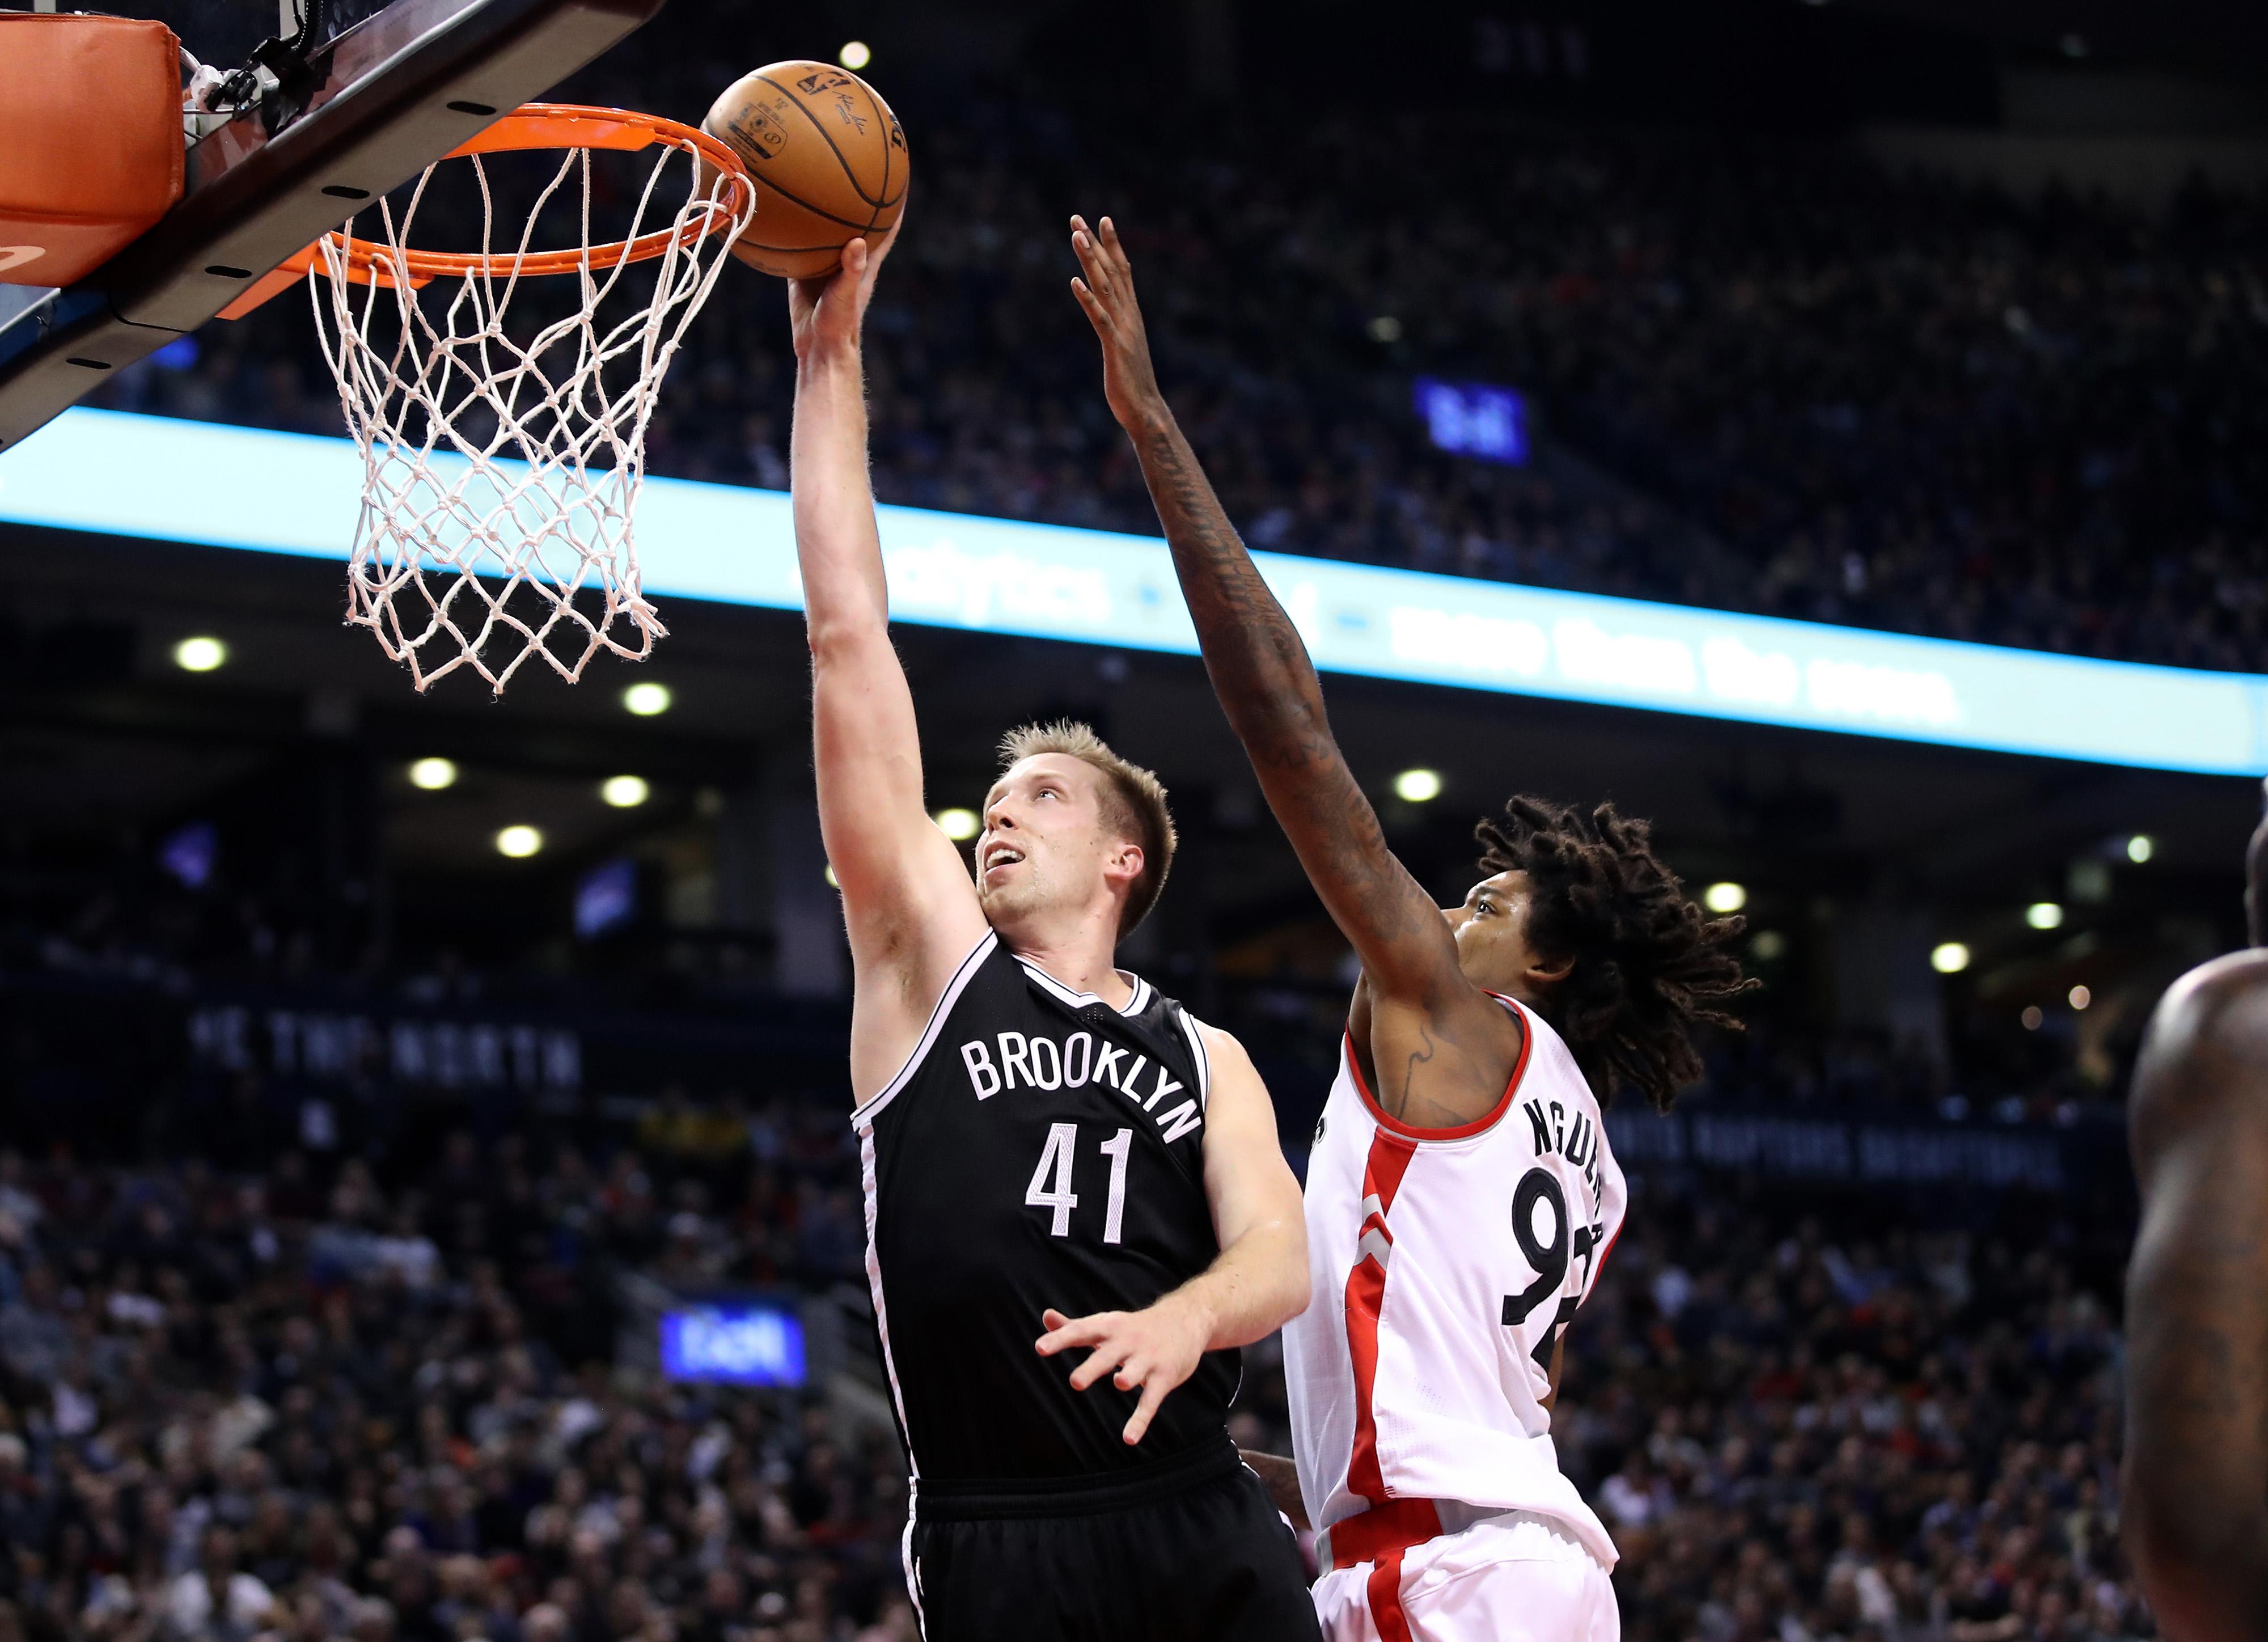 Nets Vs Raptors: Brooklyn Nets Vs. Toronto Raptors Pre-Game Report 1/13/17